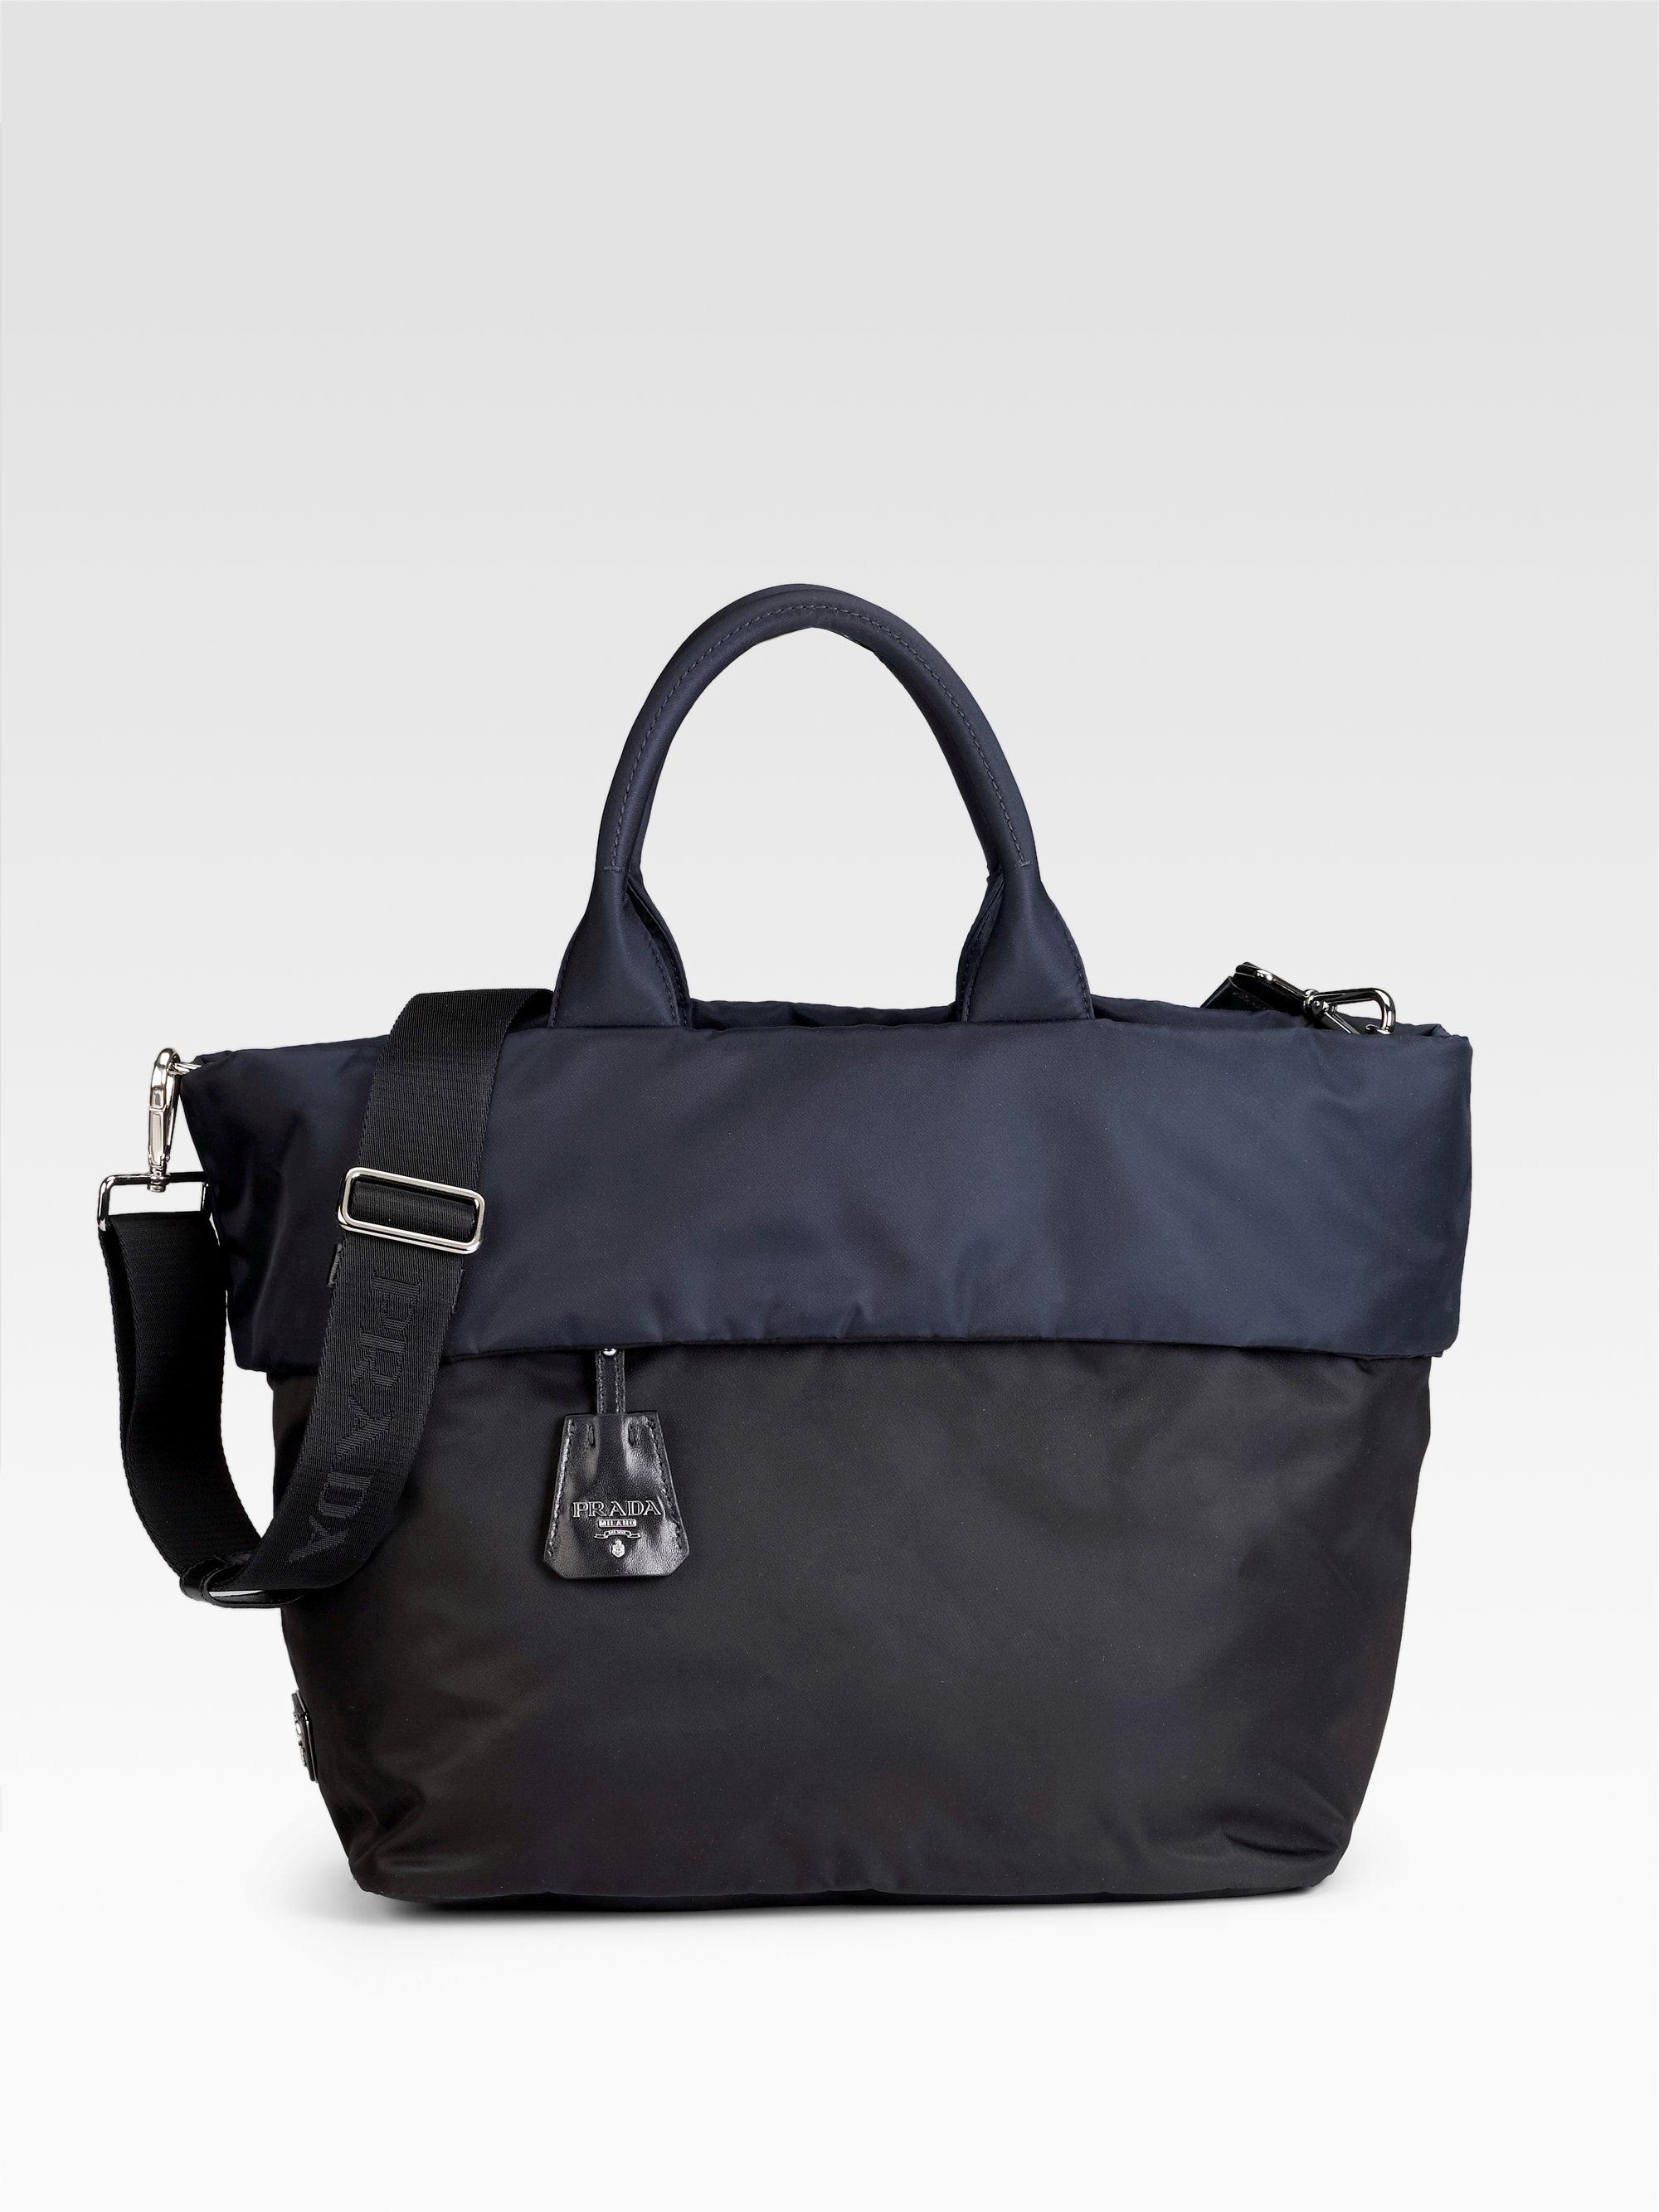 060733eb7e07 ... shopping lyst prada tessuto double tote in black 8a393 8b722